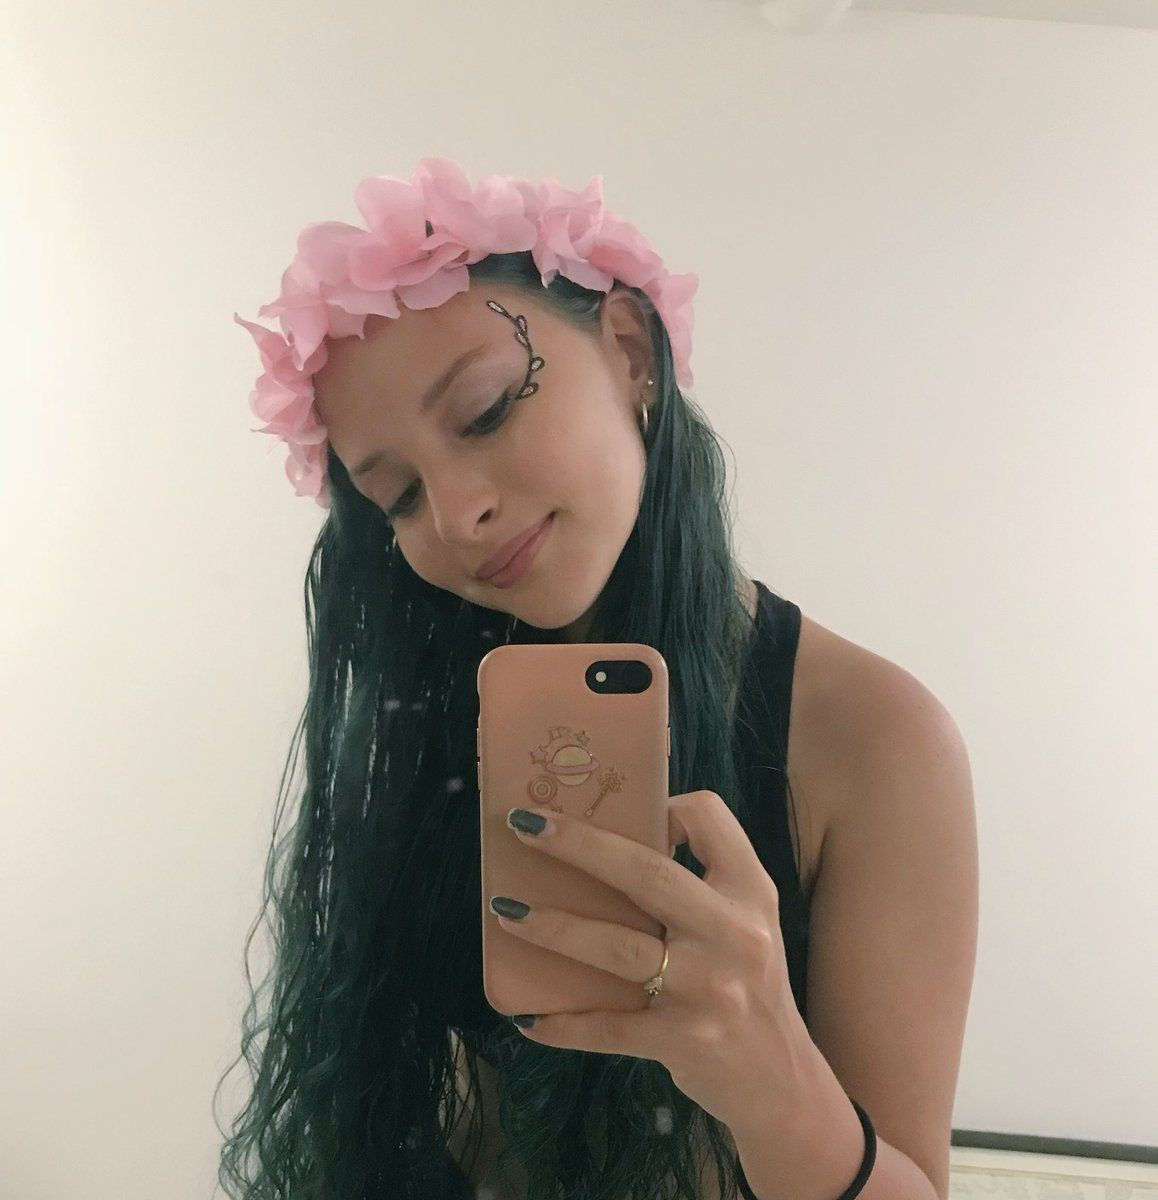 Au/Ra (heyitsau_ra) Twitter Singer, Jamie, Famous girls